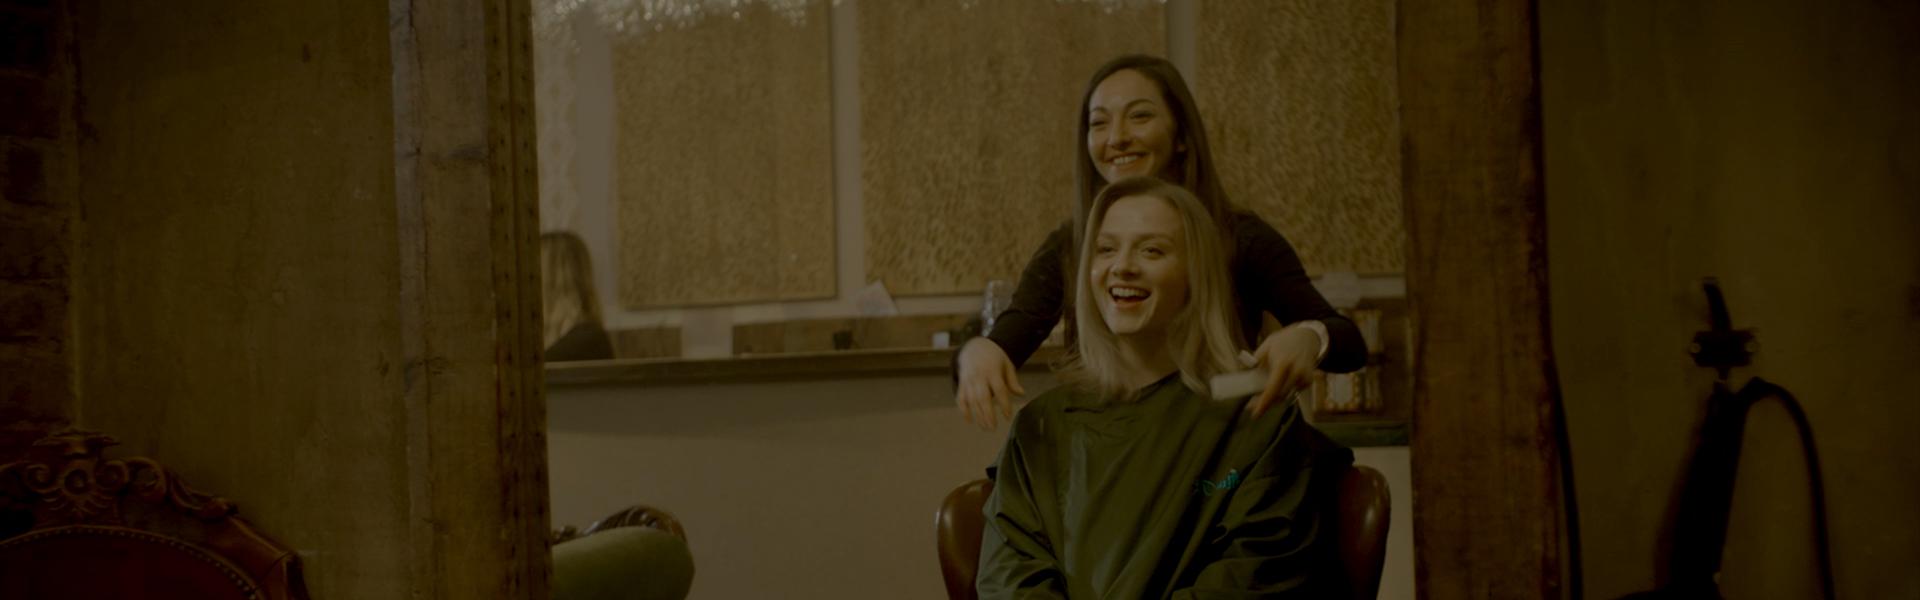 Dos mujeres en un salón de belleza